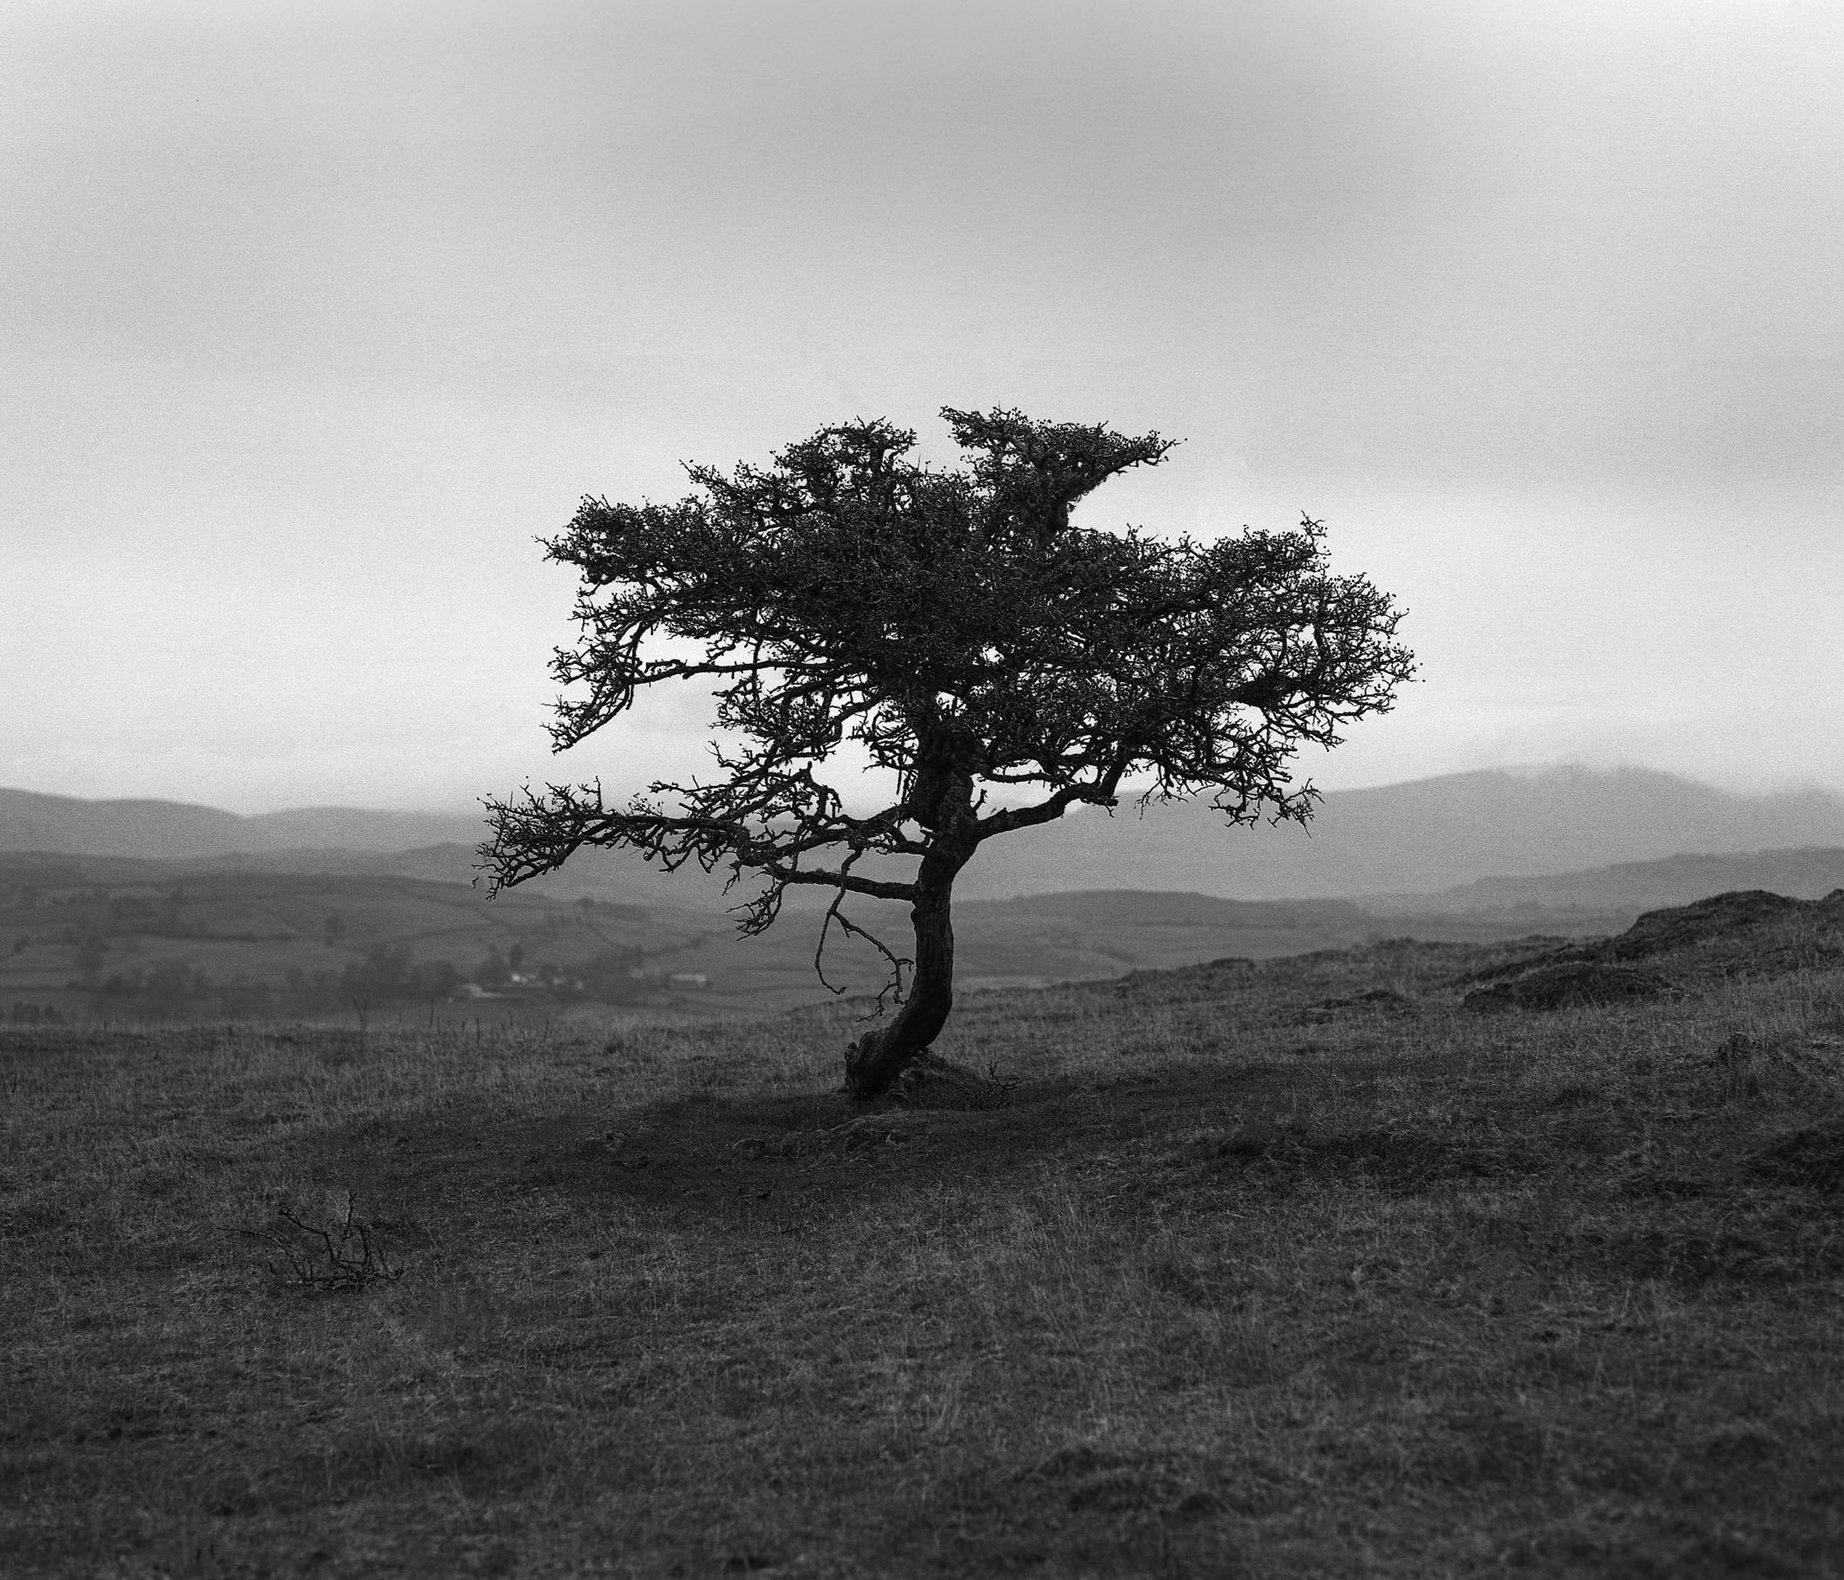 @JoeBrayford · 1h A lone tree on a rainy morning in The Lake District #IlfordPhoto #IlfordFP4 #FridayFavourites #6x7